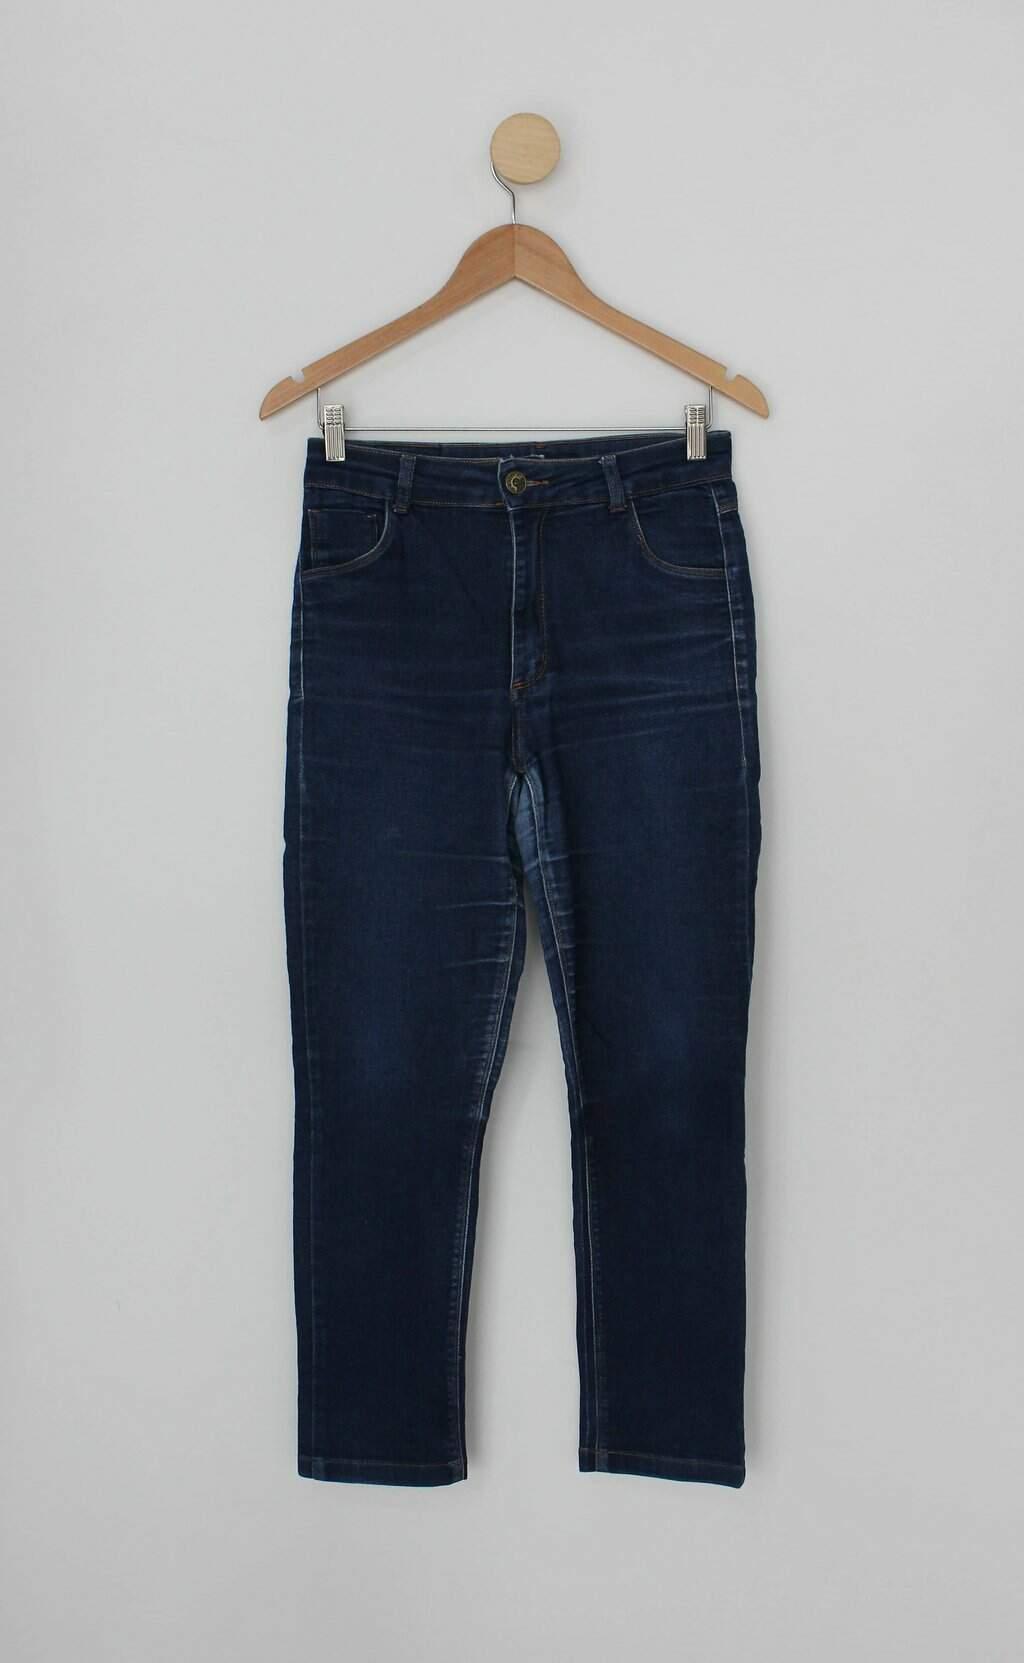 Calça Jeans Gazzy Feminina